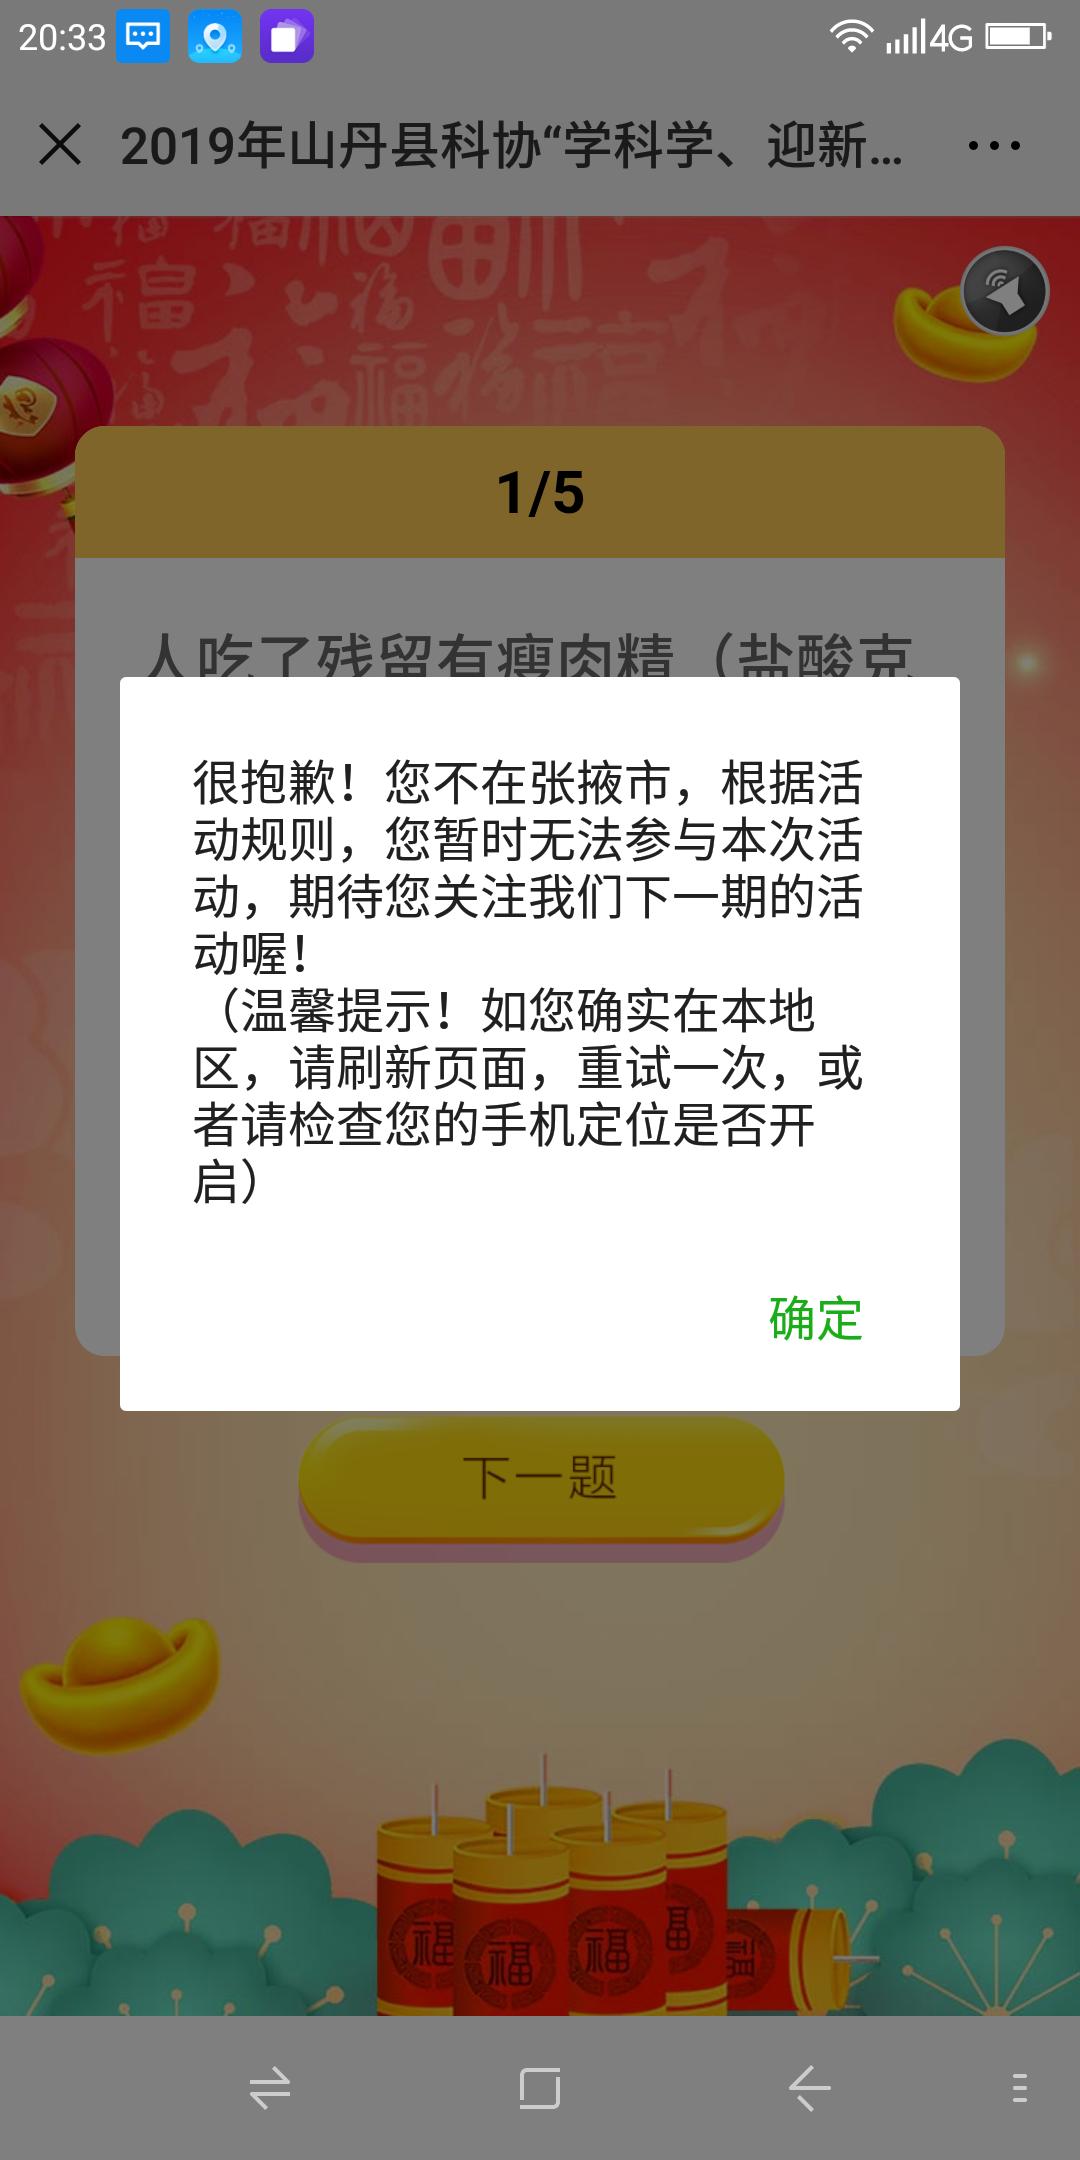 Screenshot_2019-02-08-20-33-40.png